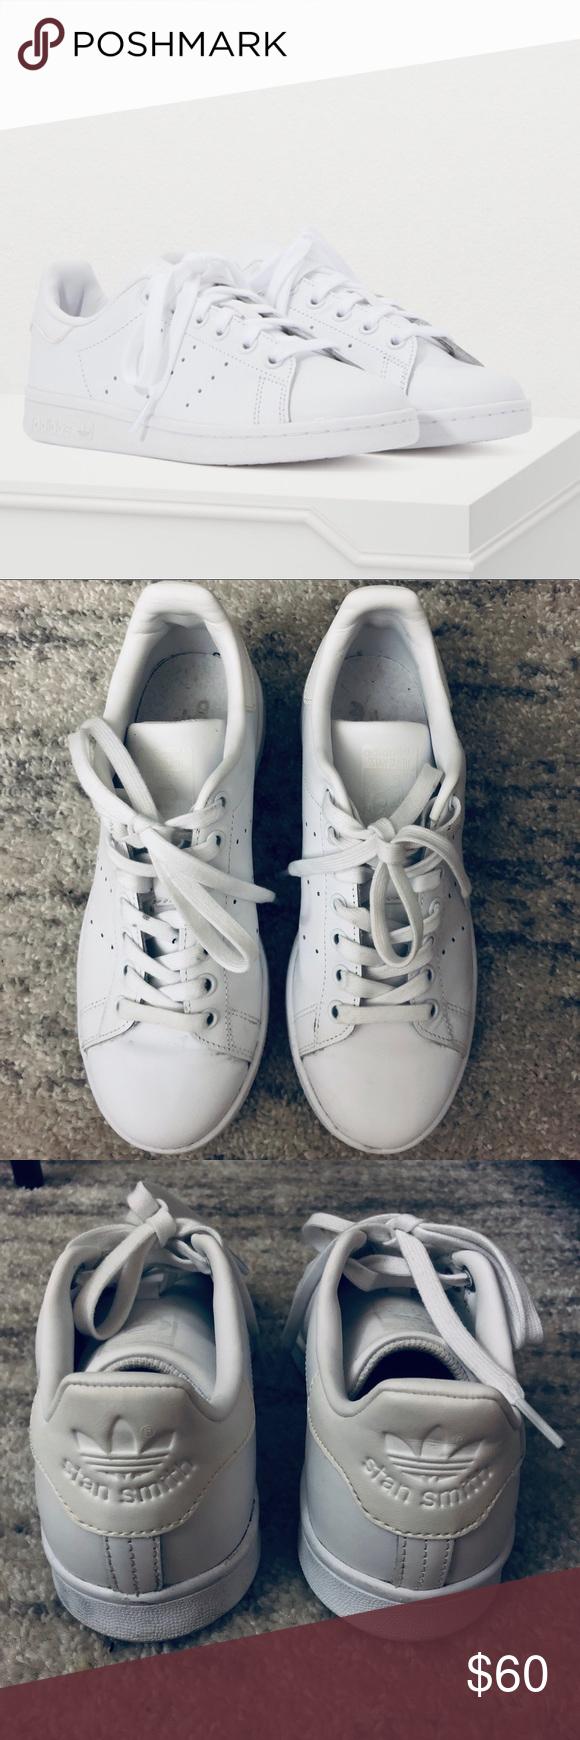 Adidas Stan Smith Sneakers 5.5 Men's/6